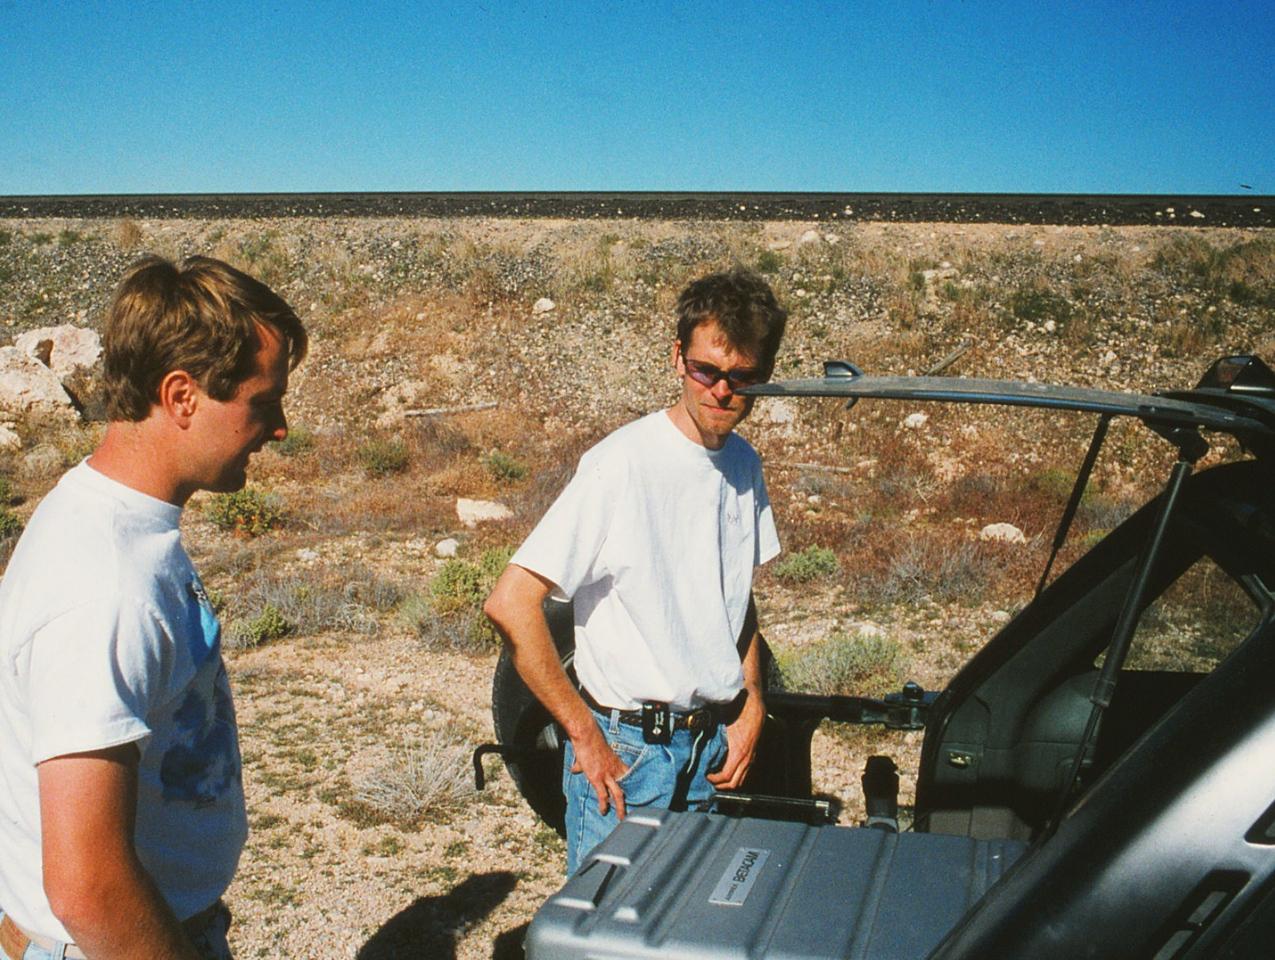 Craig Fuller of AAIR and Doug Scroggins of Lost Birds Aviation Archaeology.